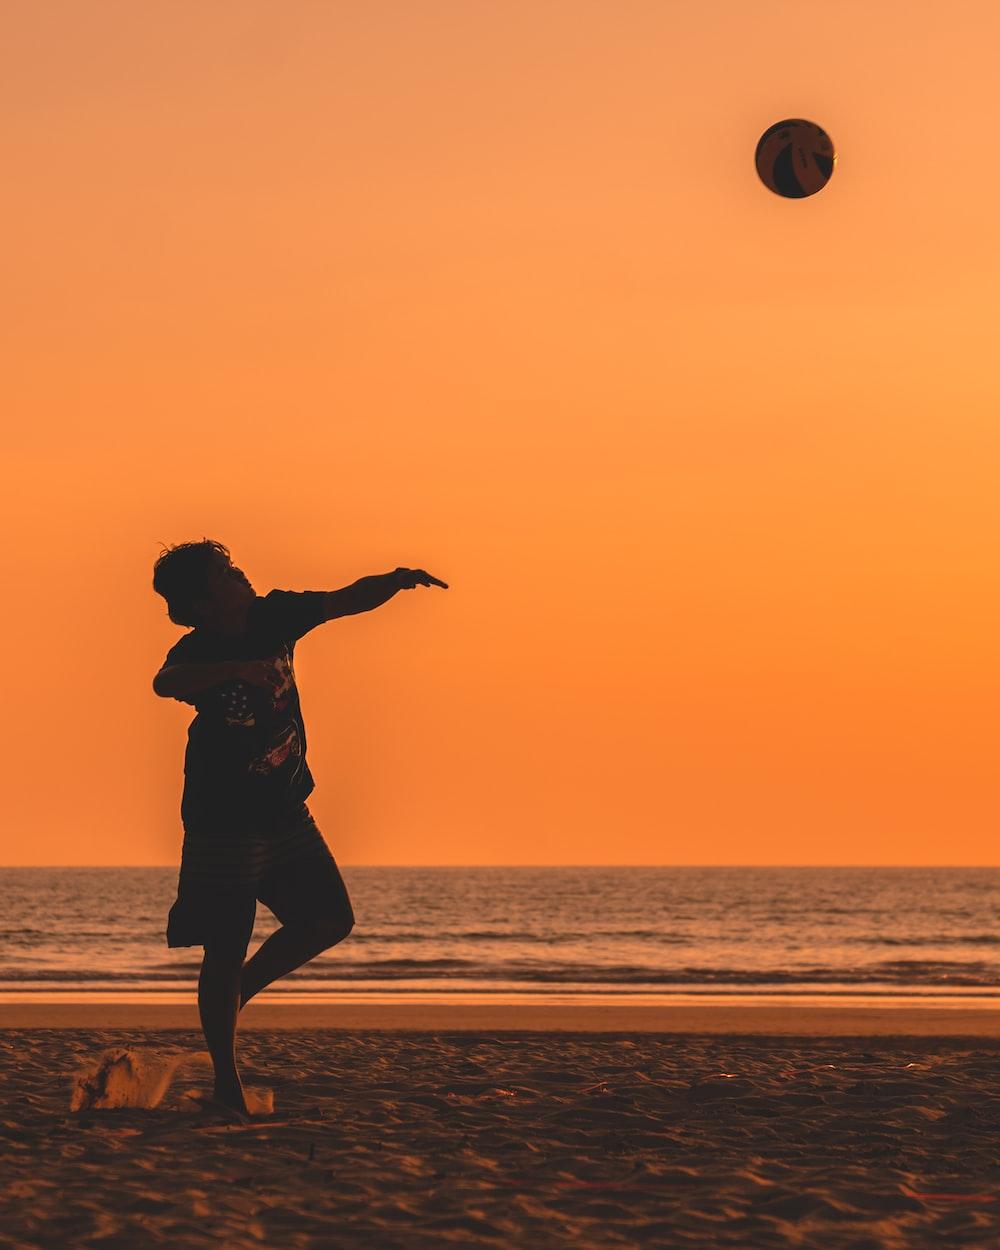 silhouette of man throwing ball near ocean at golden hour